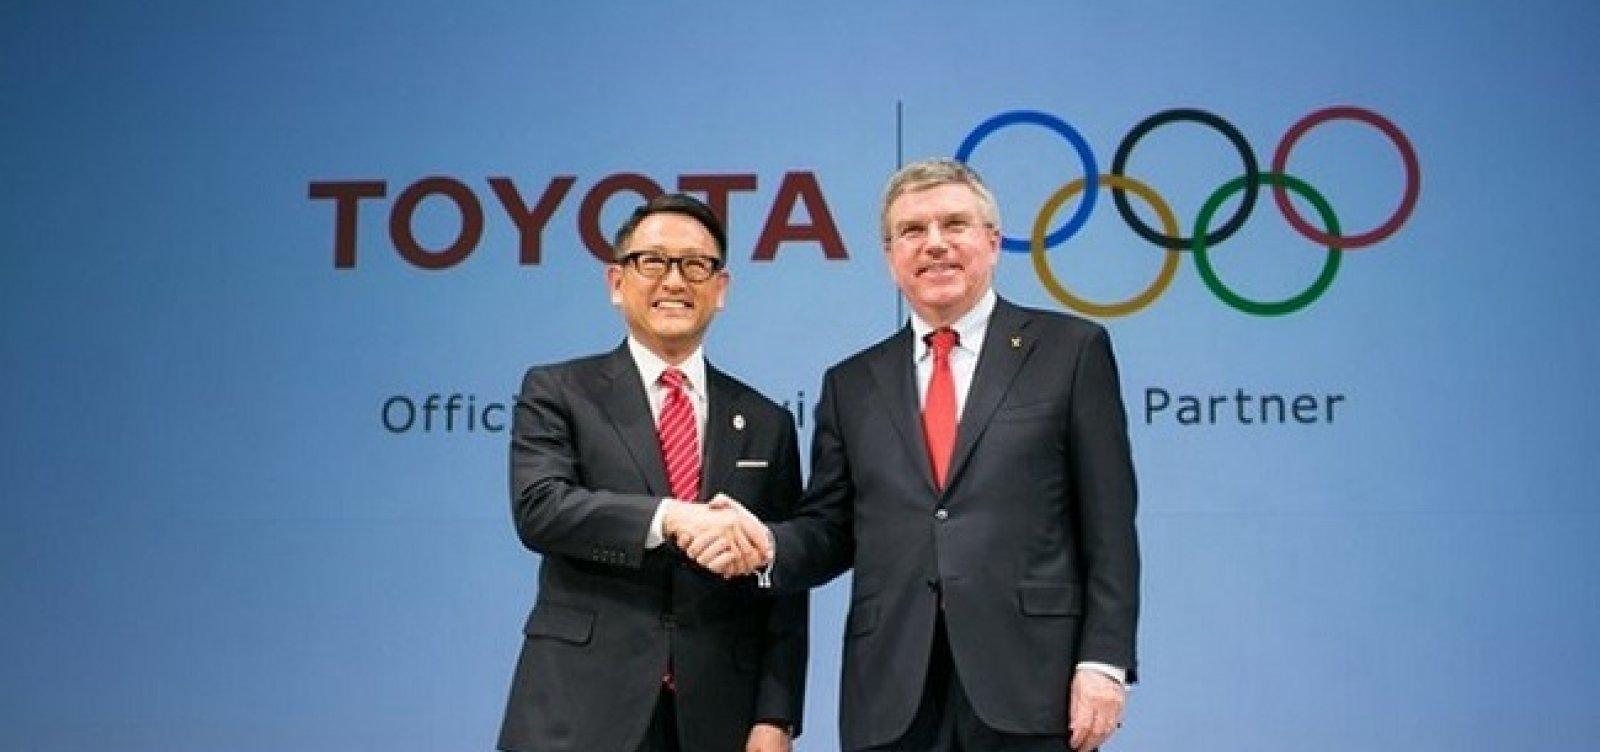 Cancelamento de anúncios da Toyota expõe incertezas entre patrocinadores das Olimpíadas